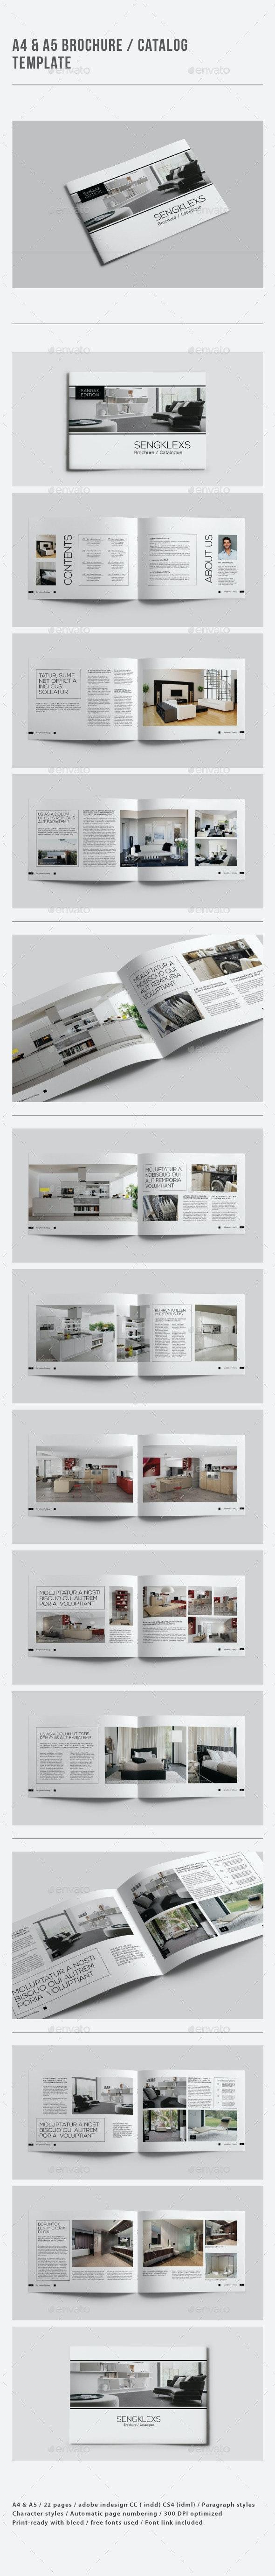 A4 & A5 Brochure / Catalogue Template - Catalogs Brochures